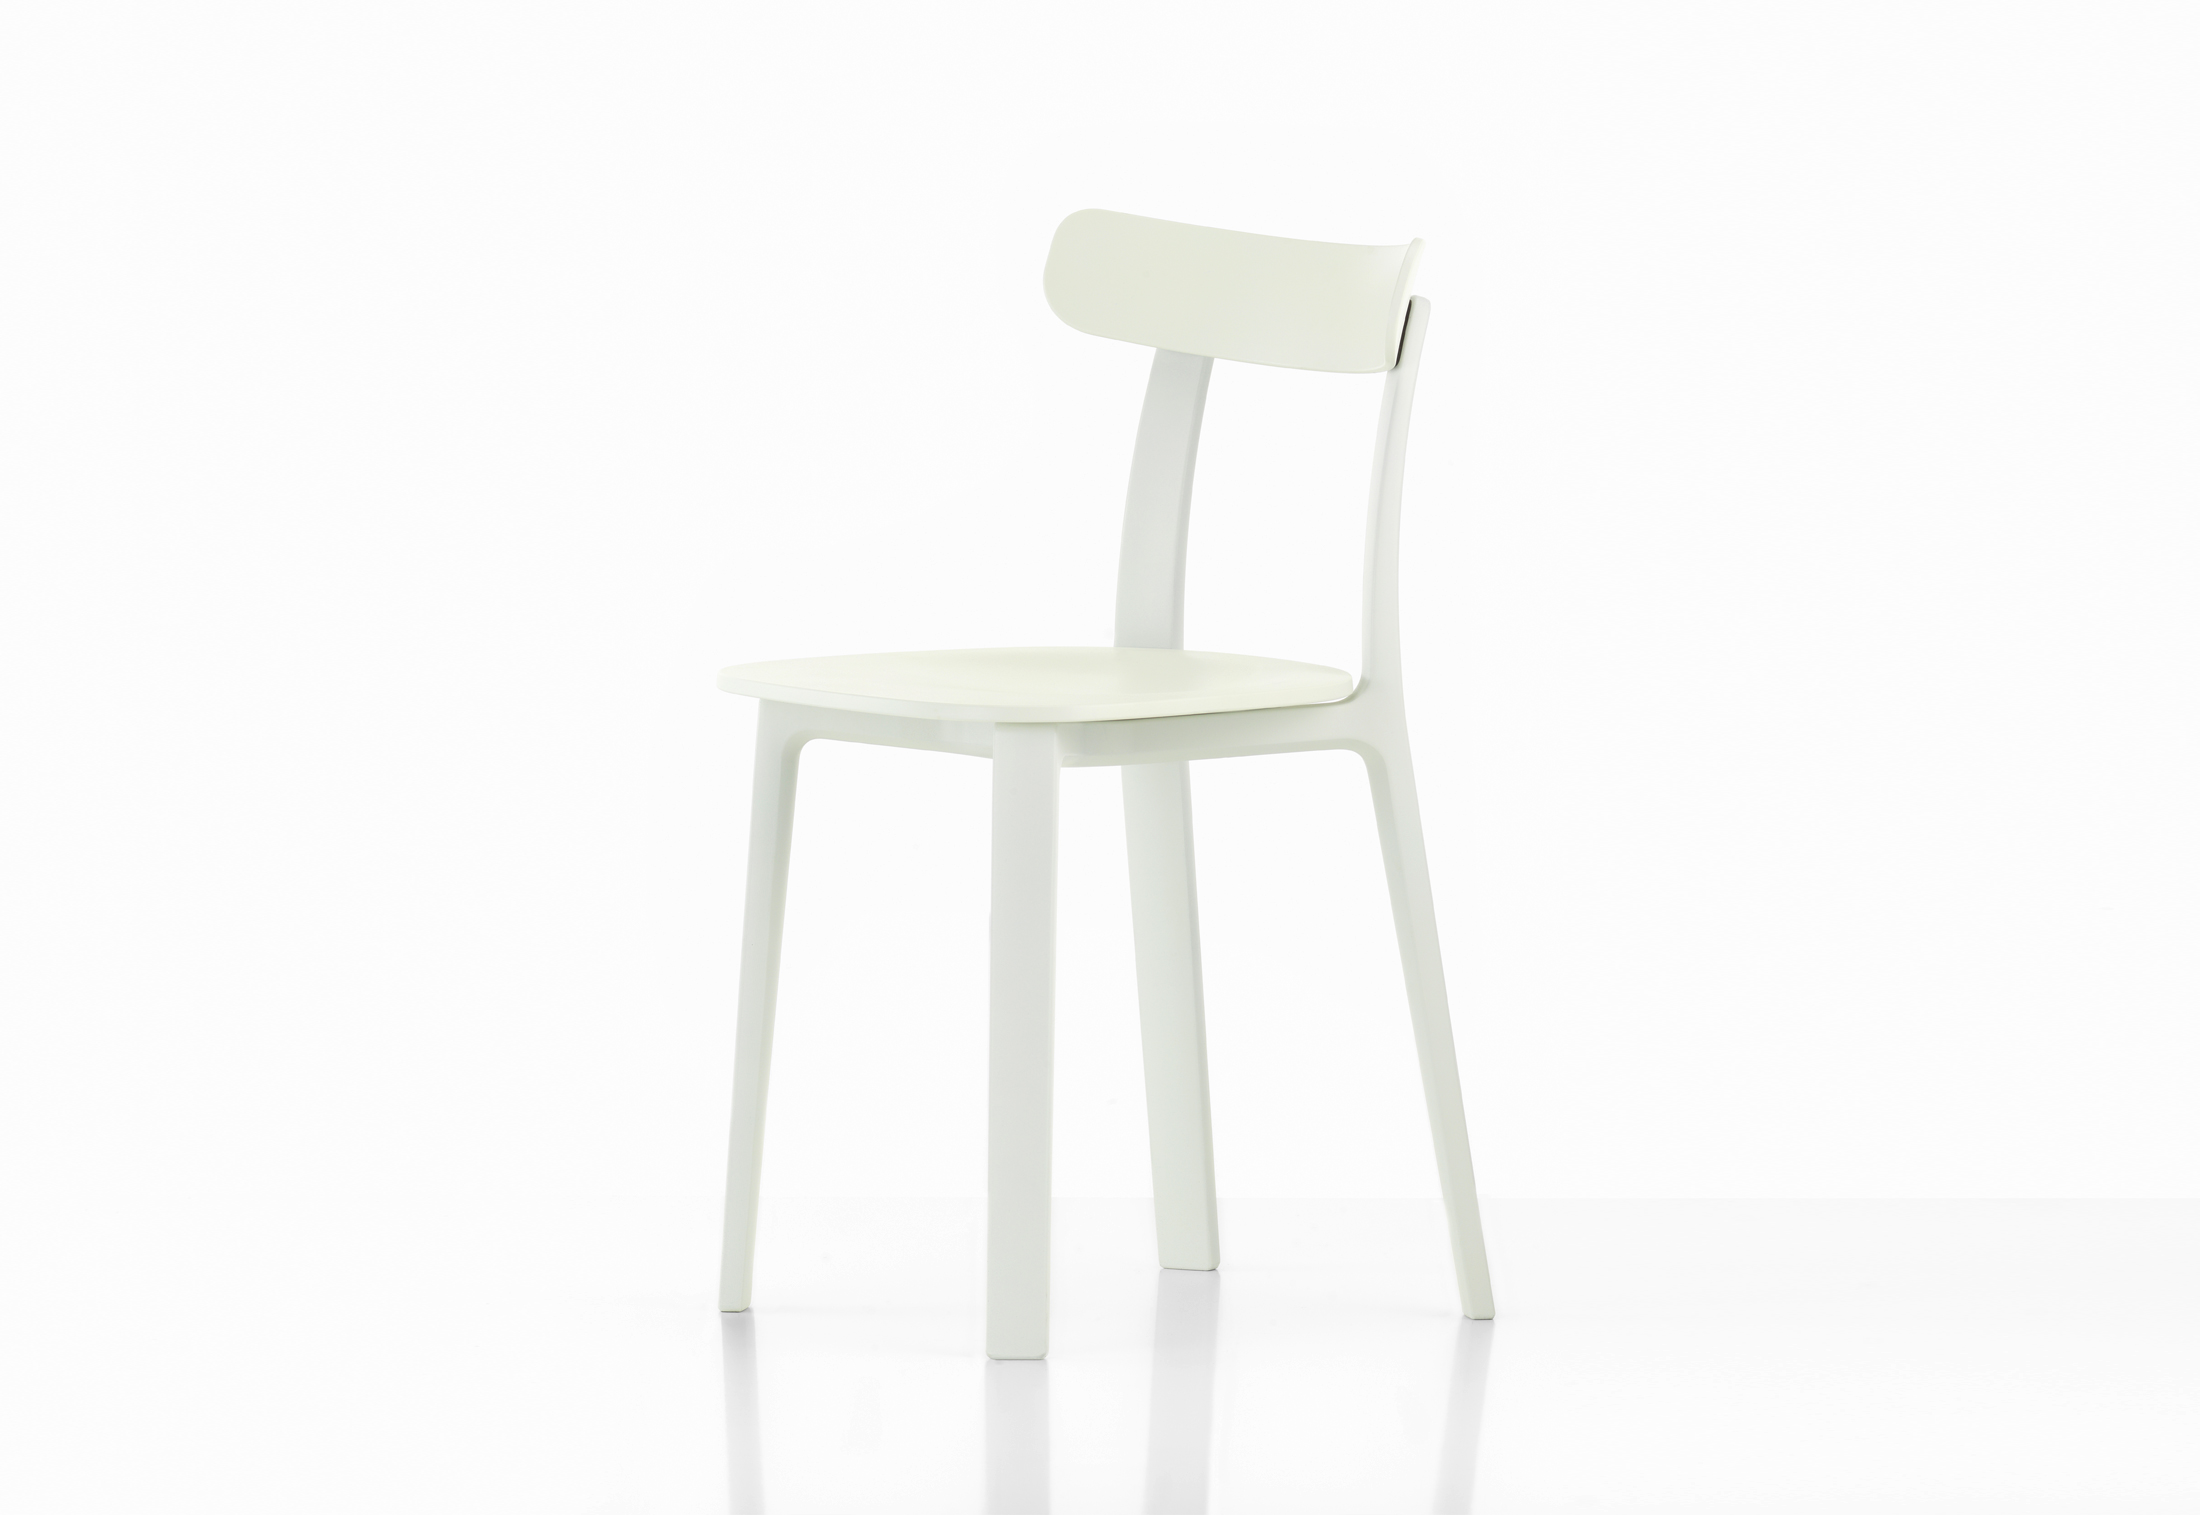 All Plastic Chair by Jasper Morrison for Vitra